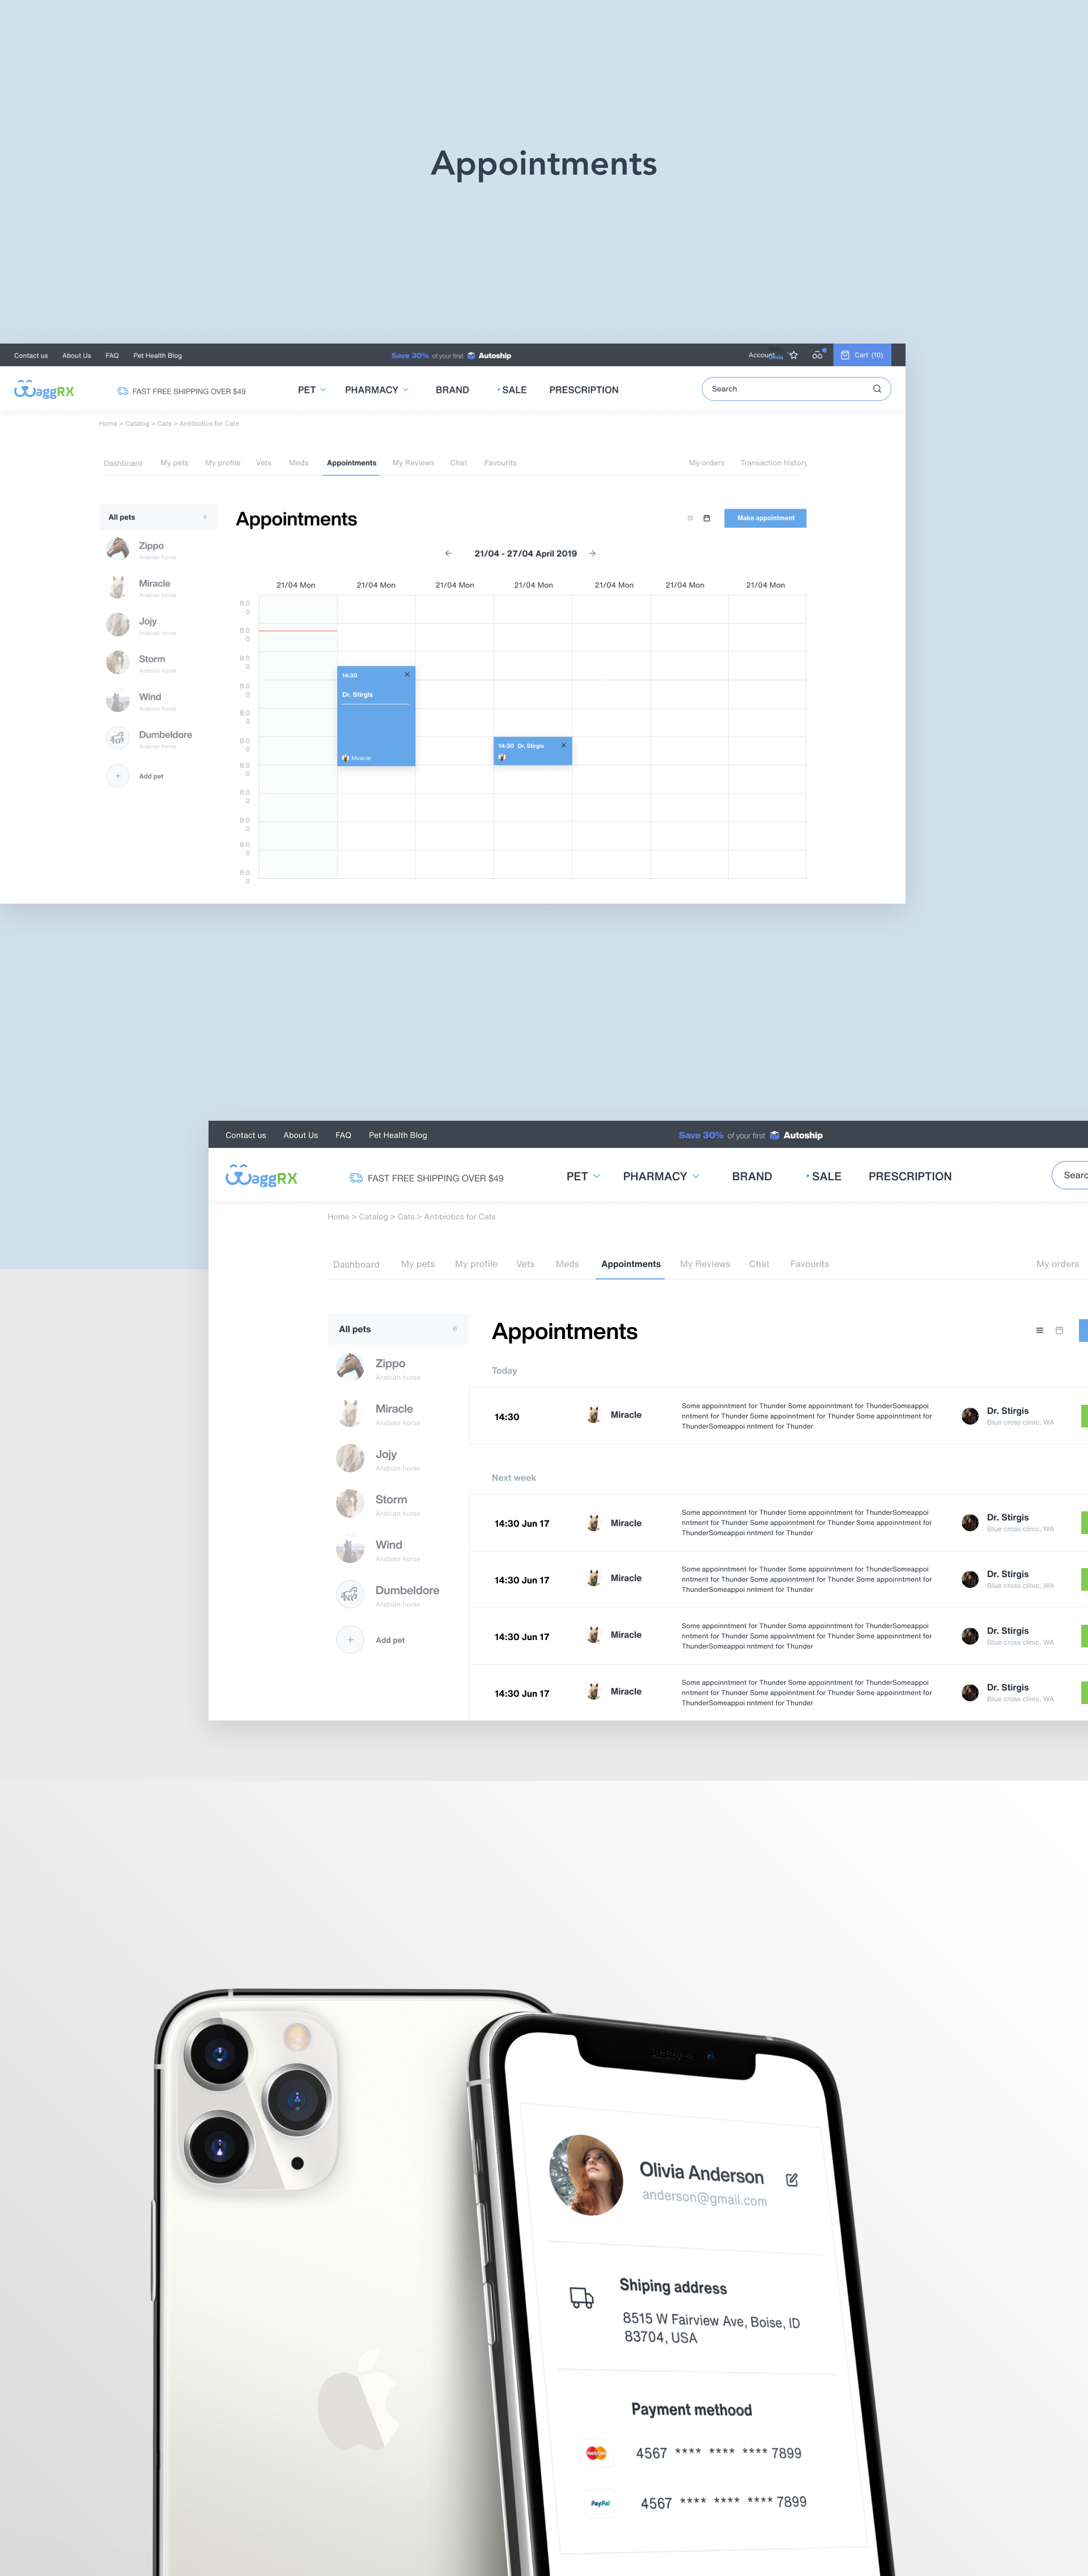 Appointments In Online Vet Pharmacy Made By Litnevski Studio In 2020 Web Design Healthcare Design Online Vet